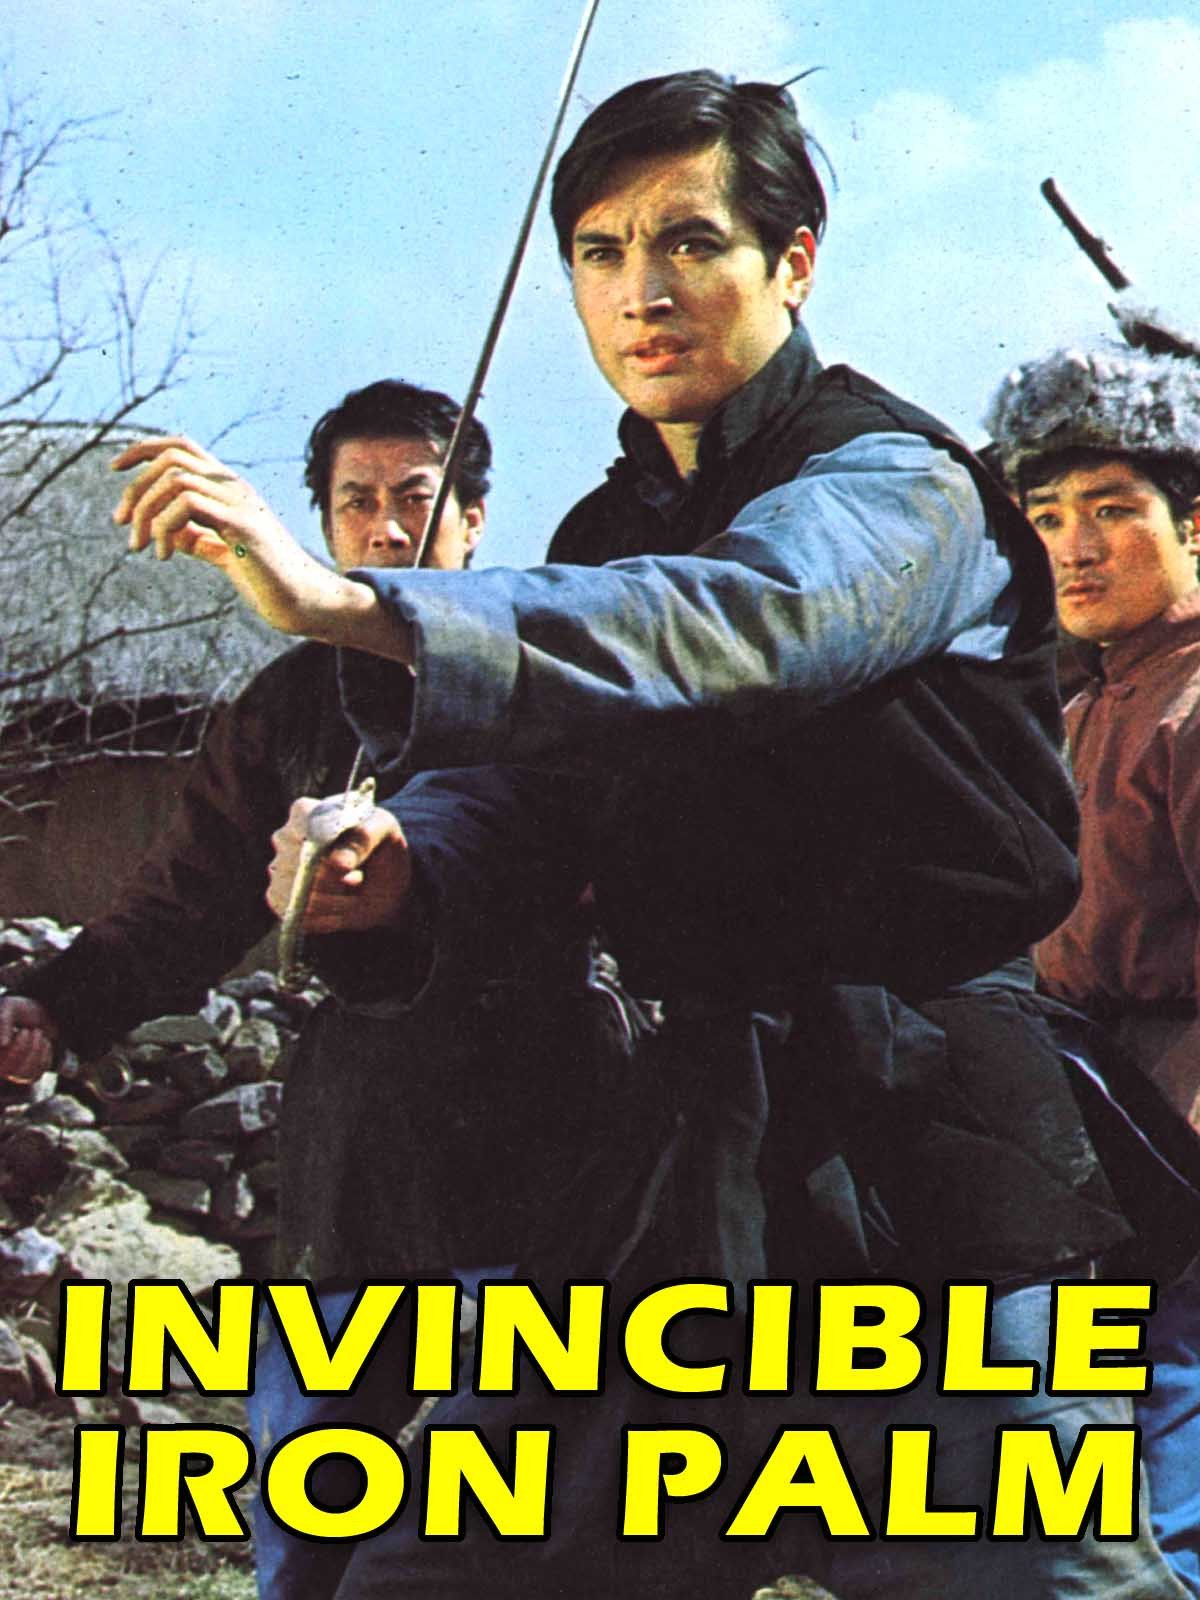 Invincible Iron Palm